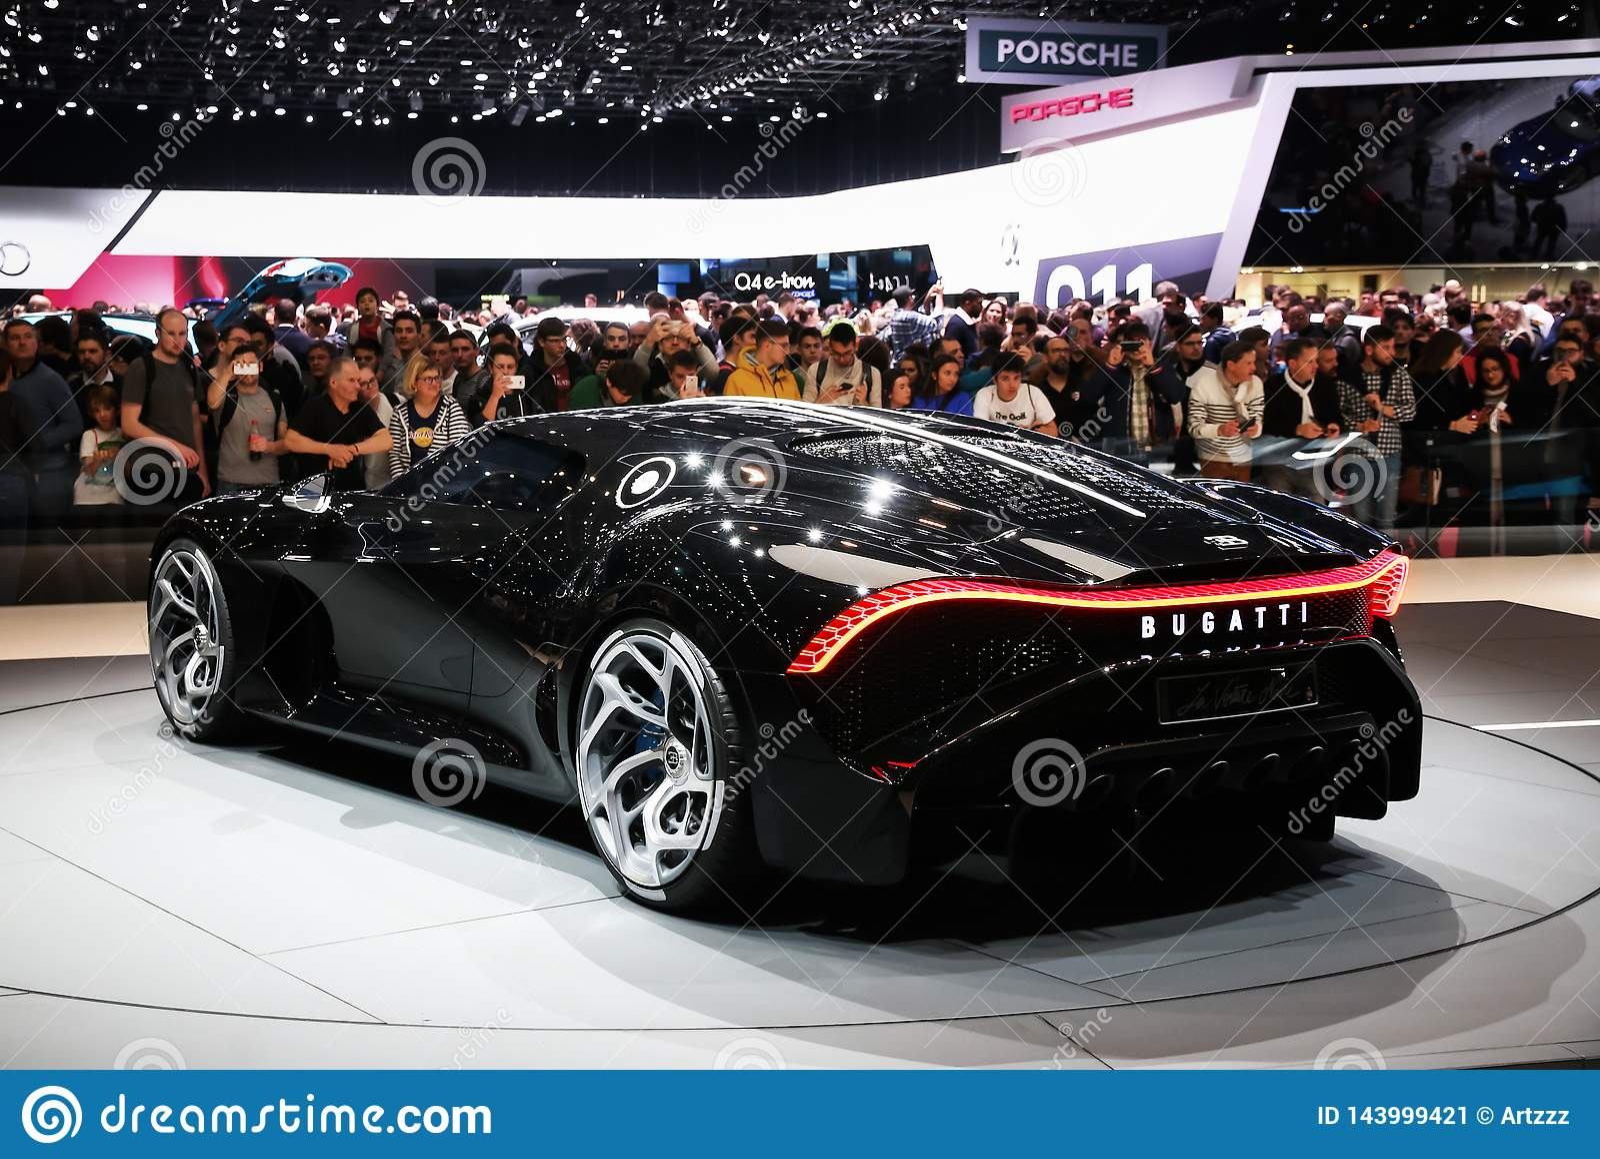 Download 2019 Bugatti La Voiture Noire Luxury Car: Bugatti La Voiture Noire Editorial Photo. Image Of Back